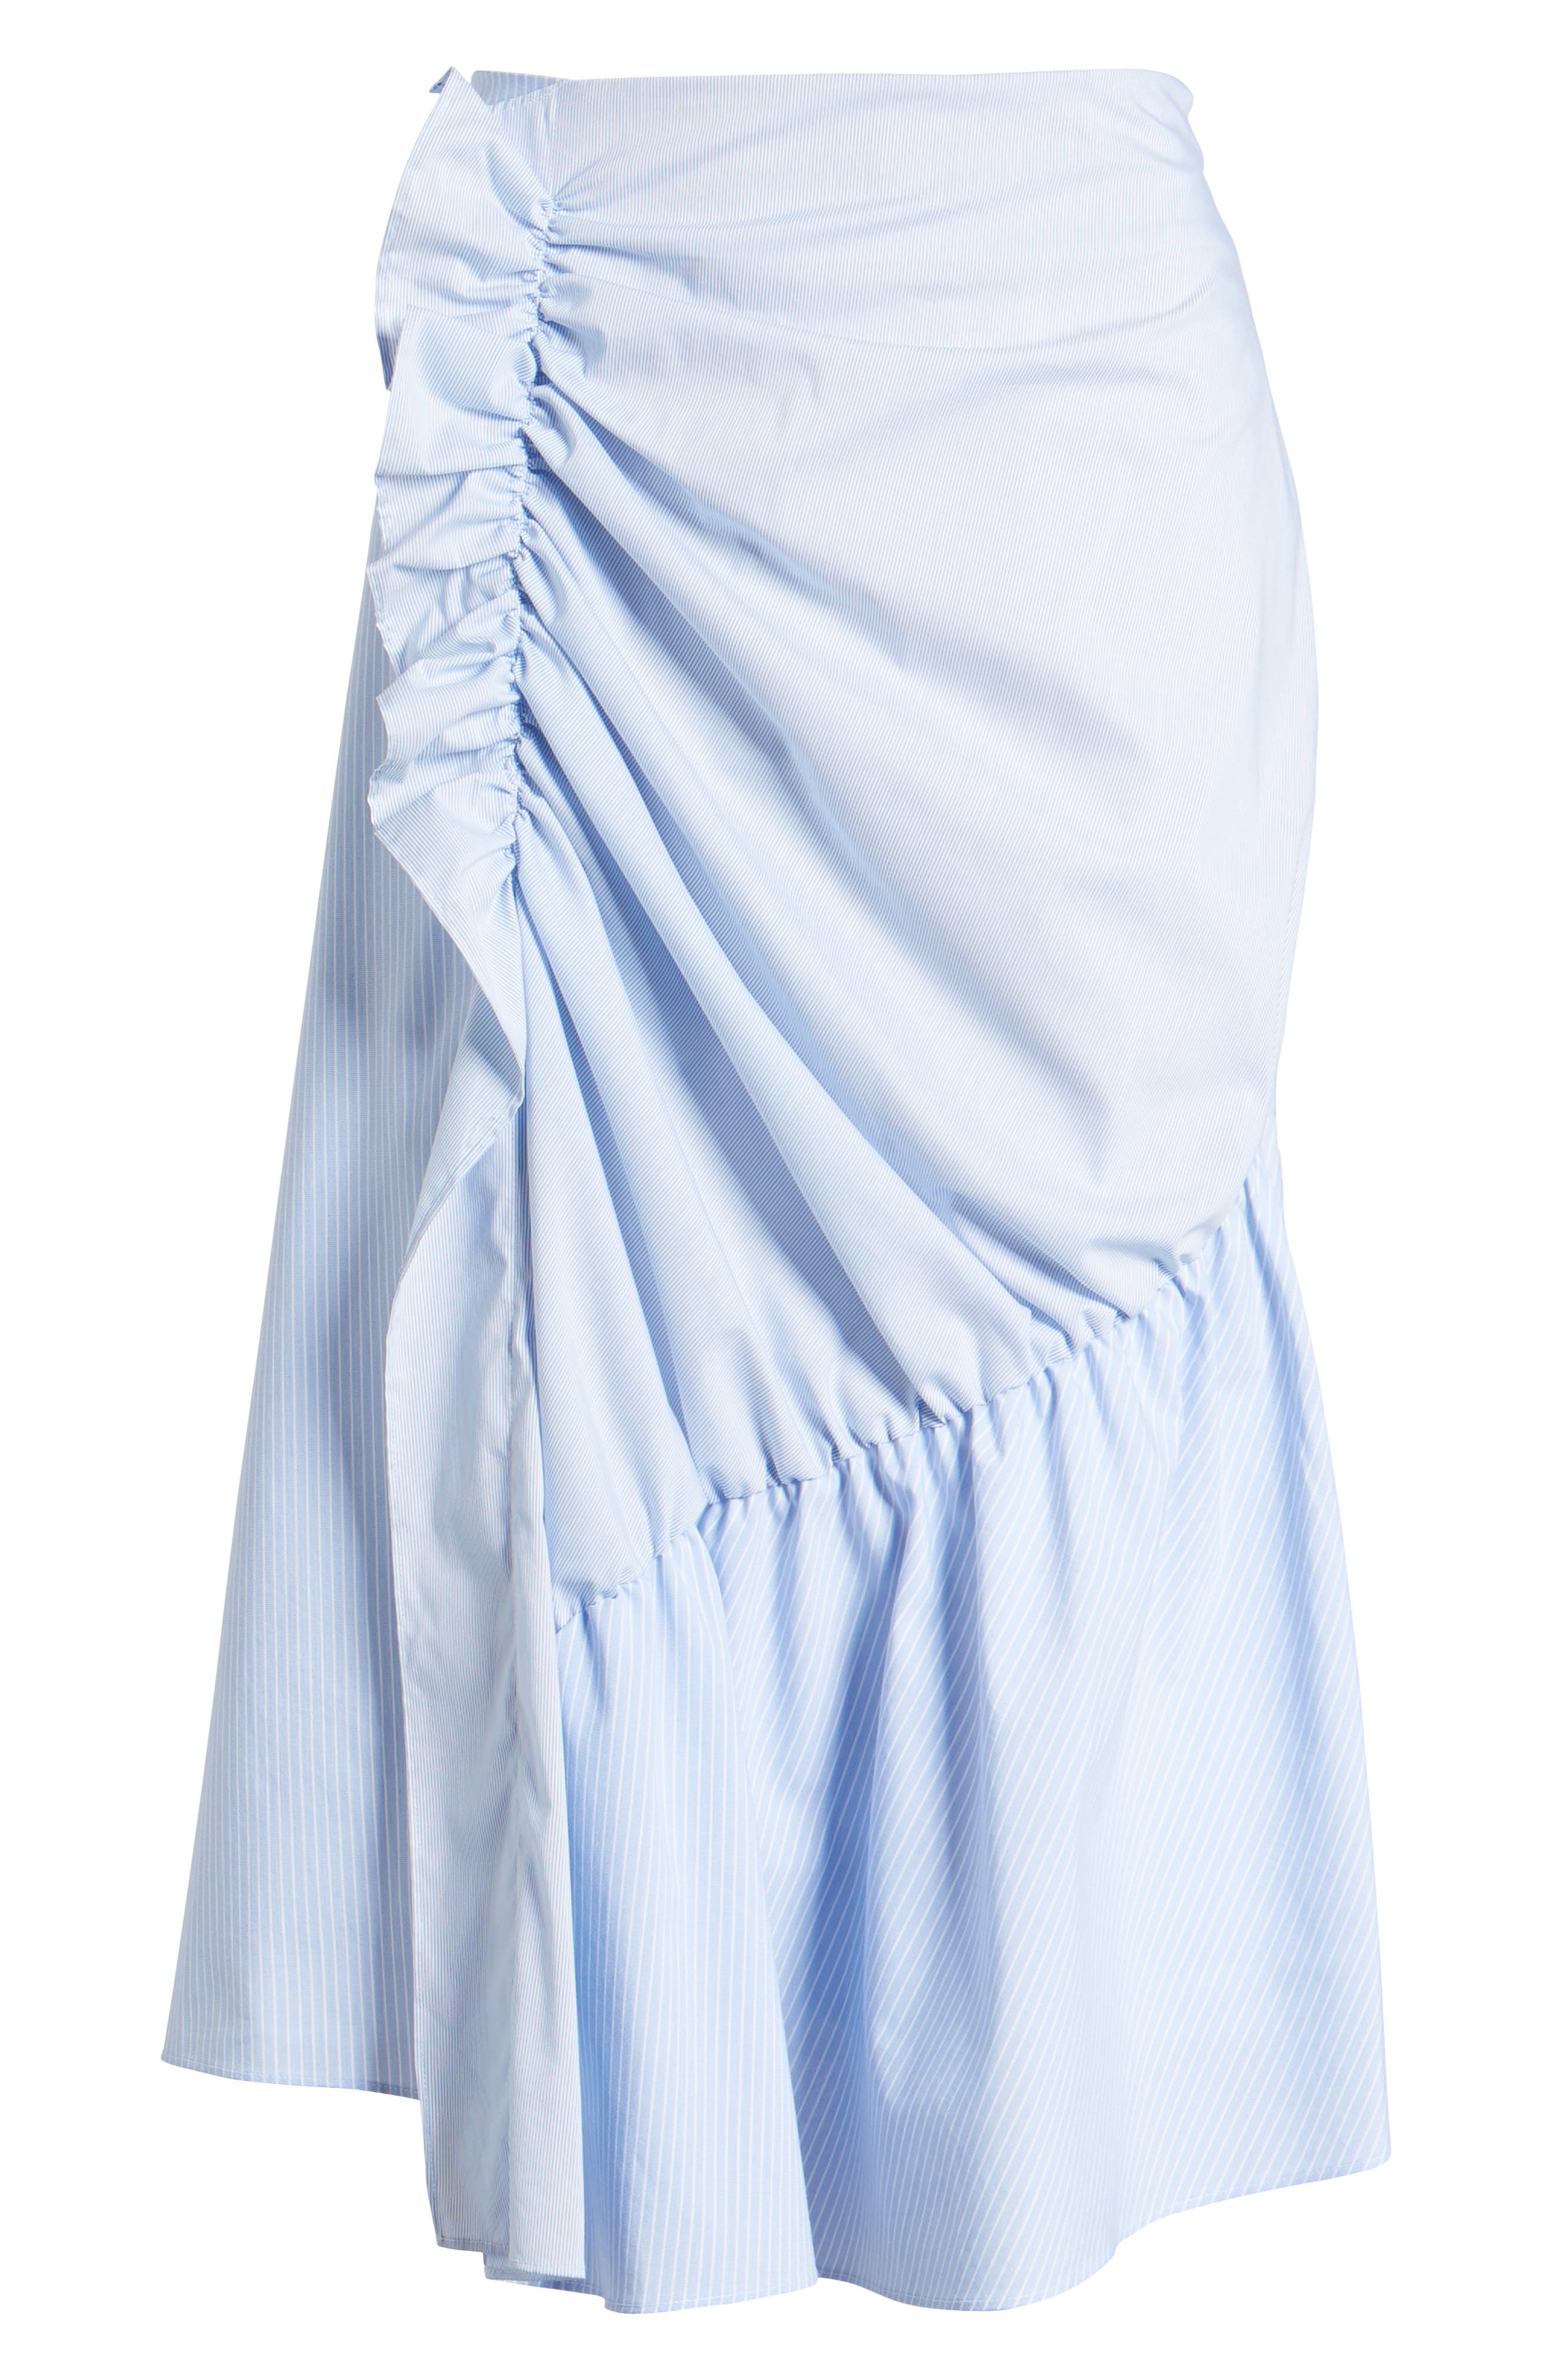 Mixed Stripe Poplin A-Line Skirt,                             Alternate thumbnail 6, color,                             Blue/ White Pinstripe